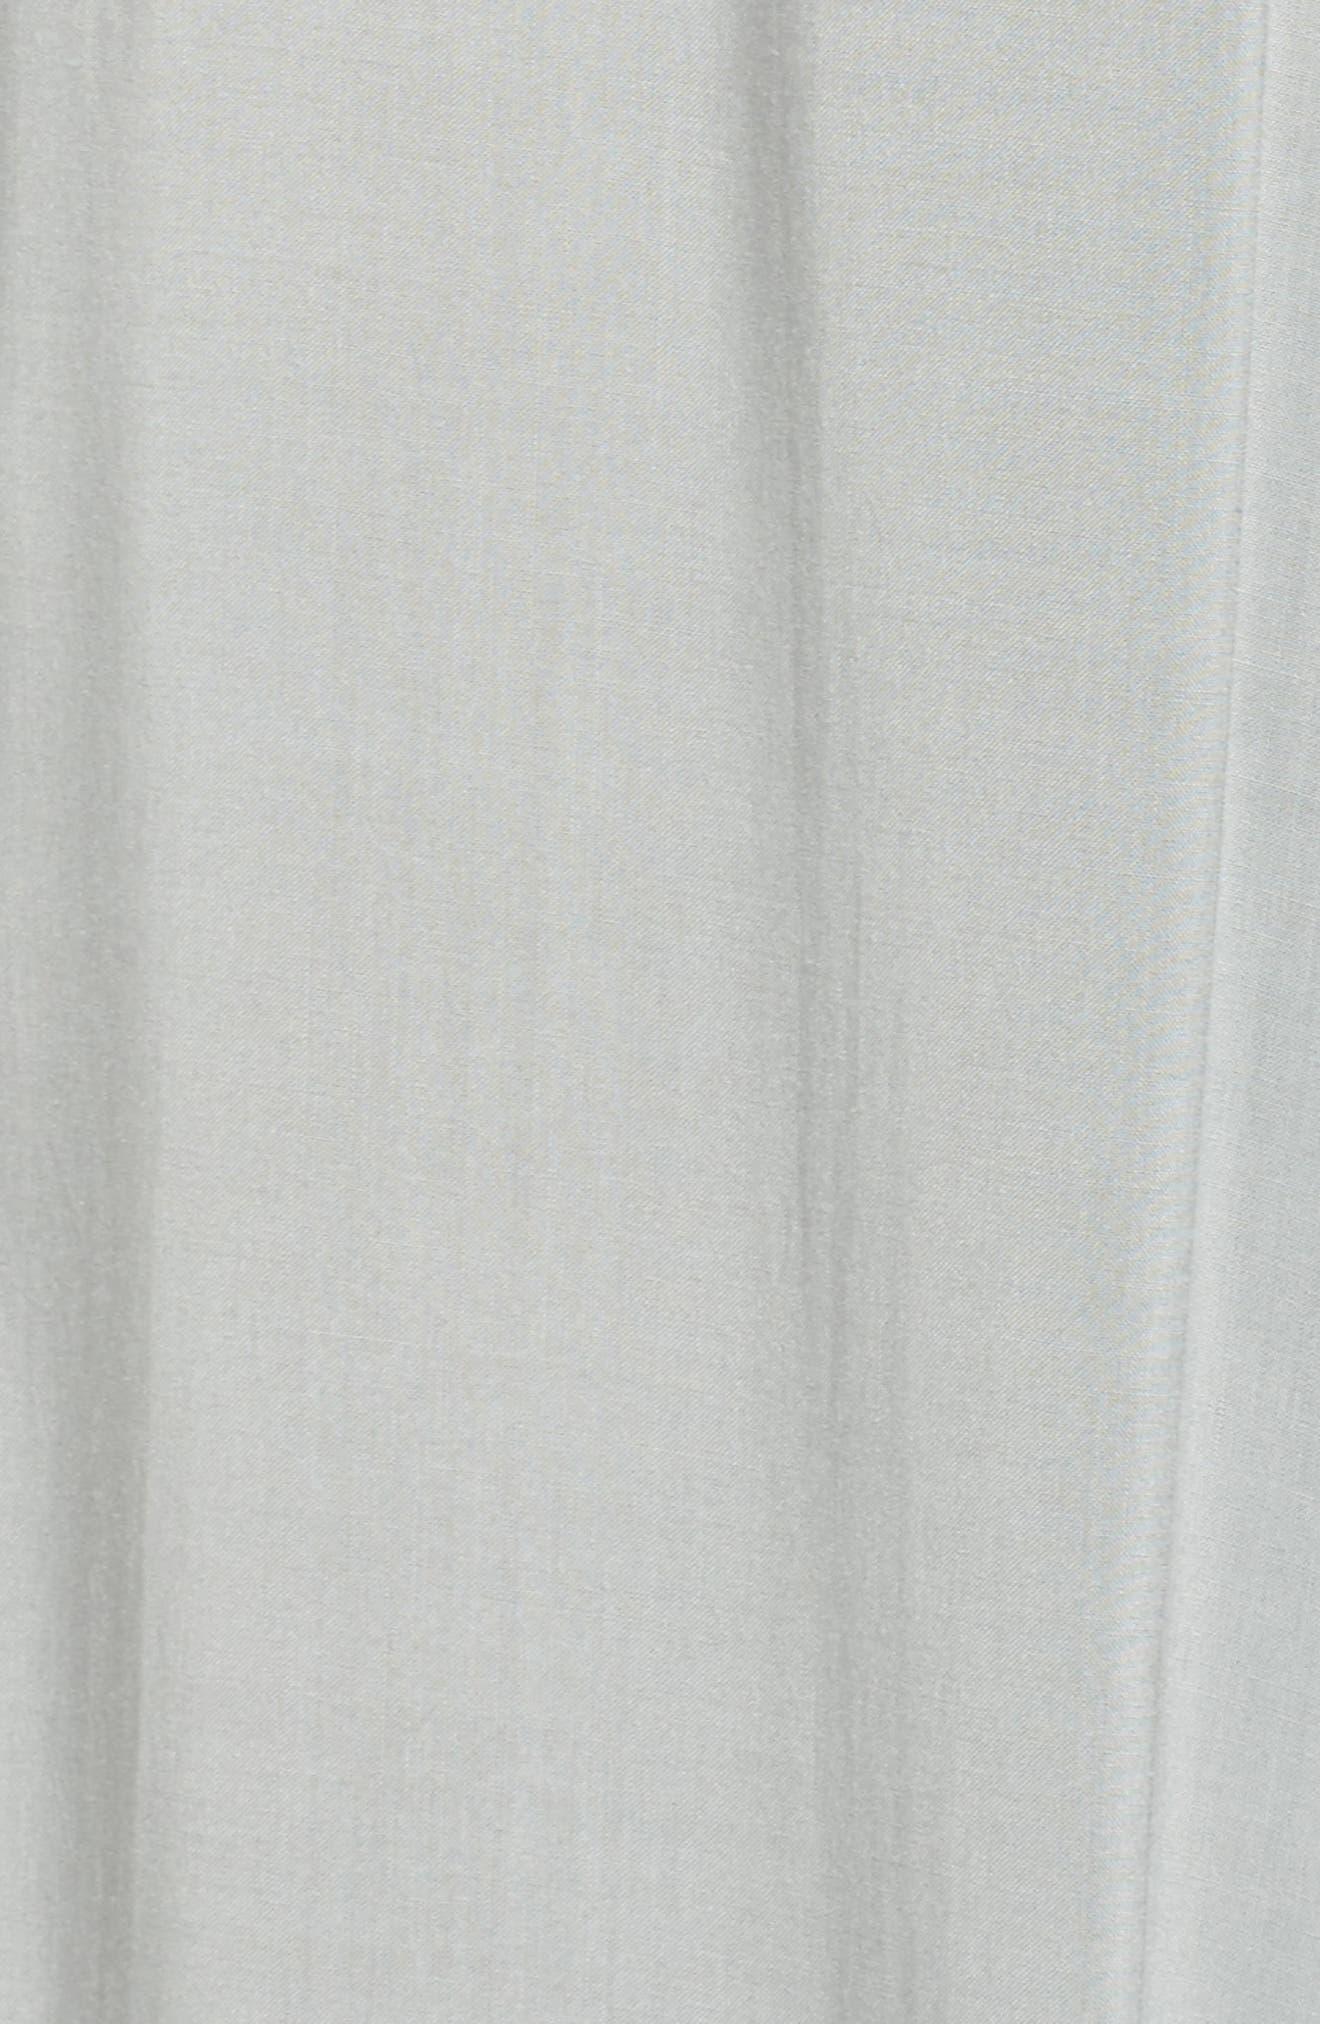 Cover-Up Flyaway Pants,                             Alternate thumbnail 5, color,                             Seafoam